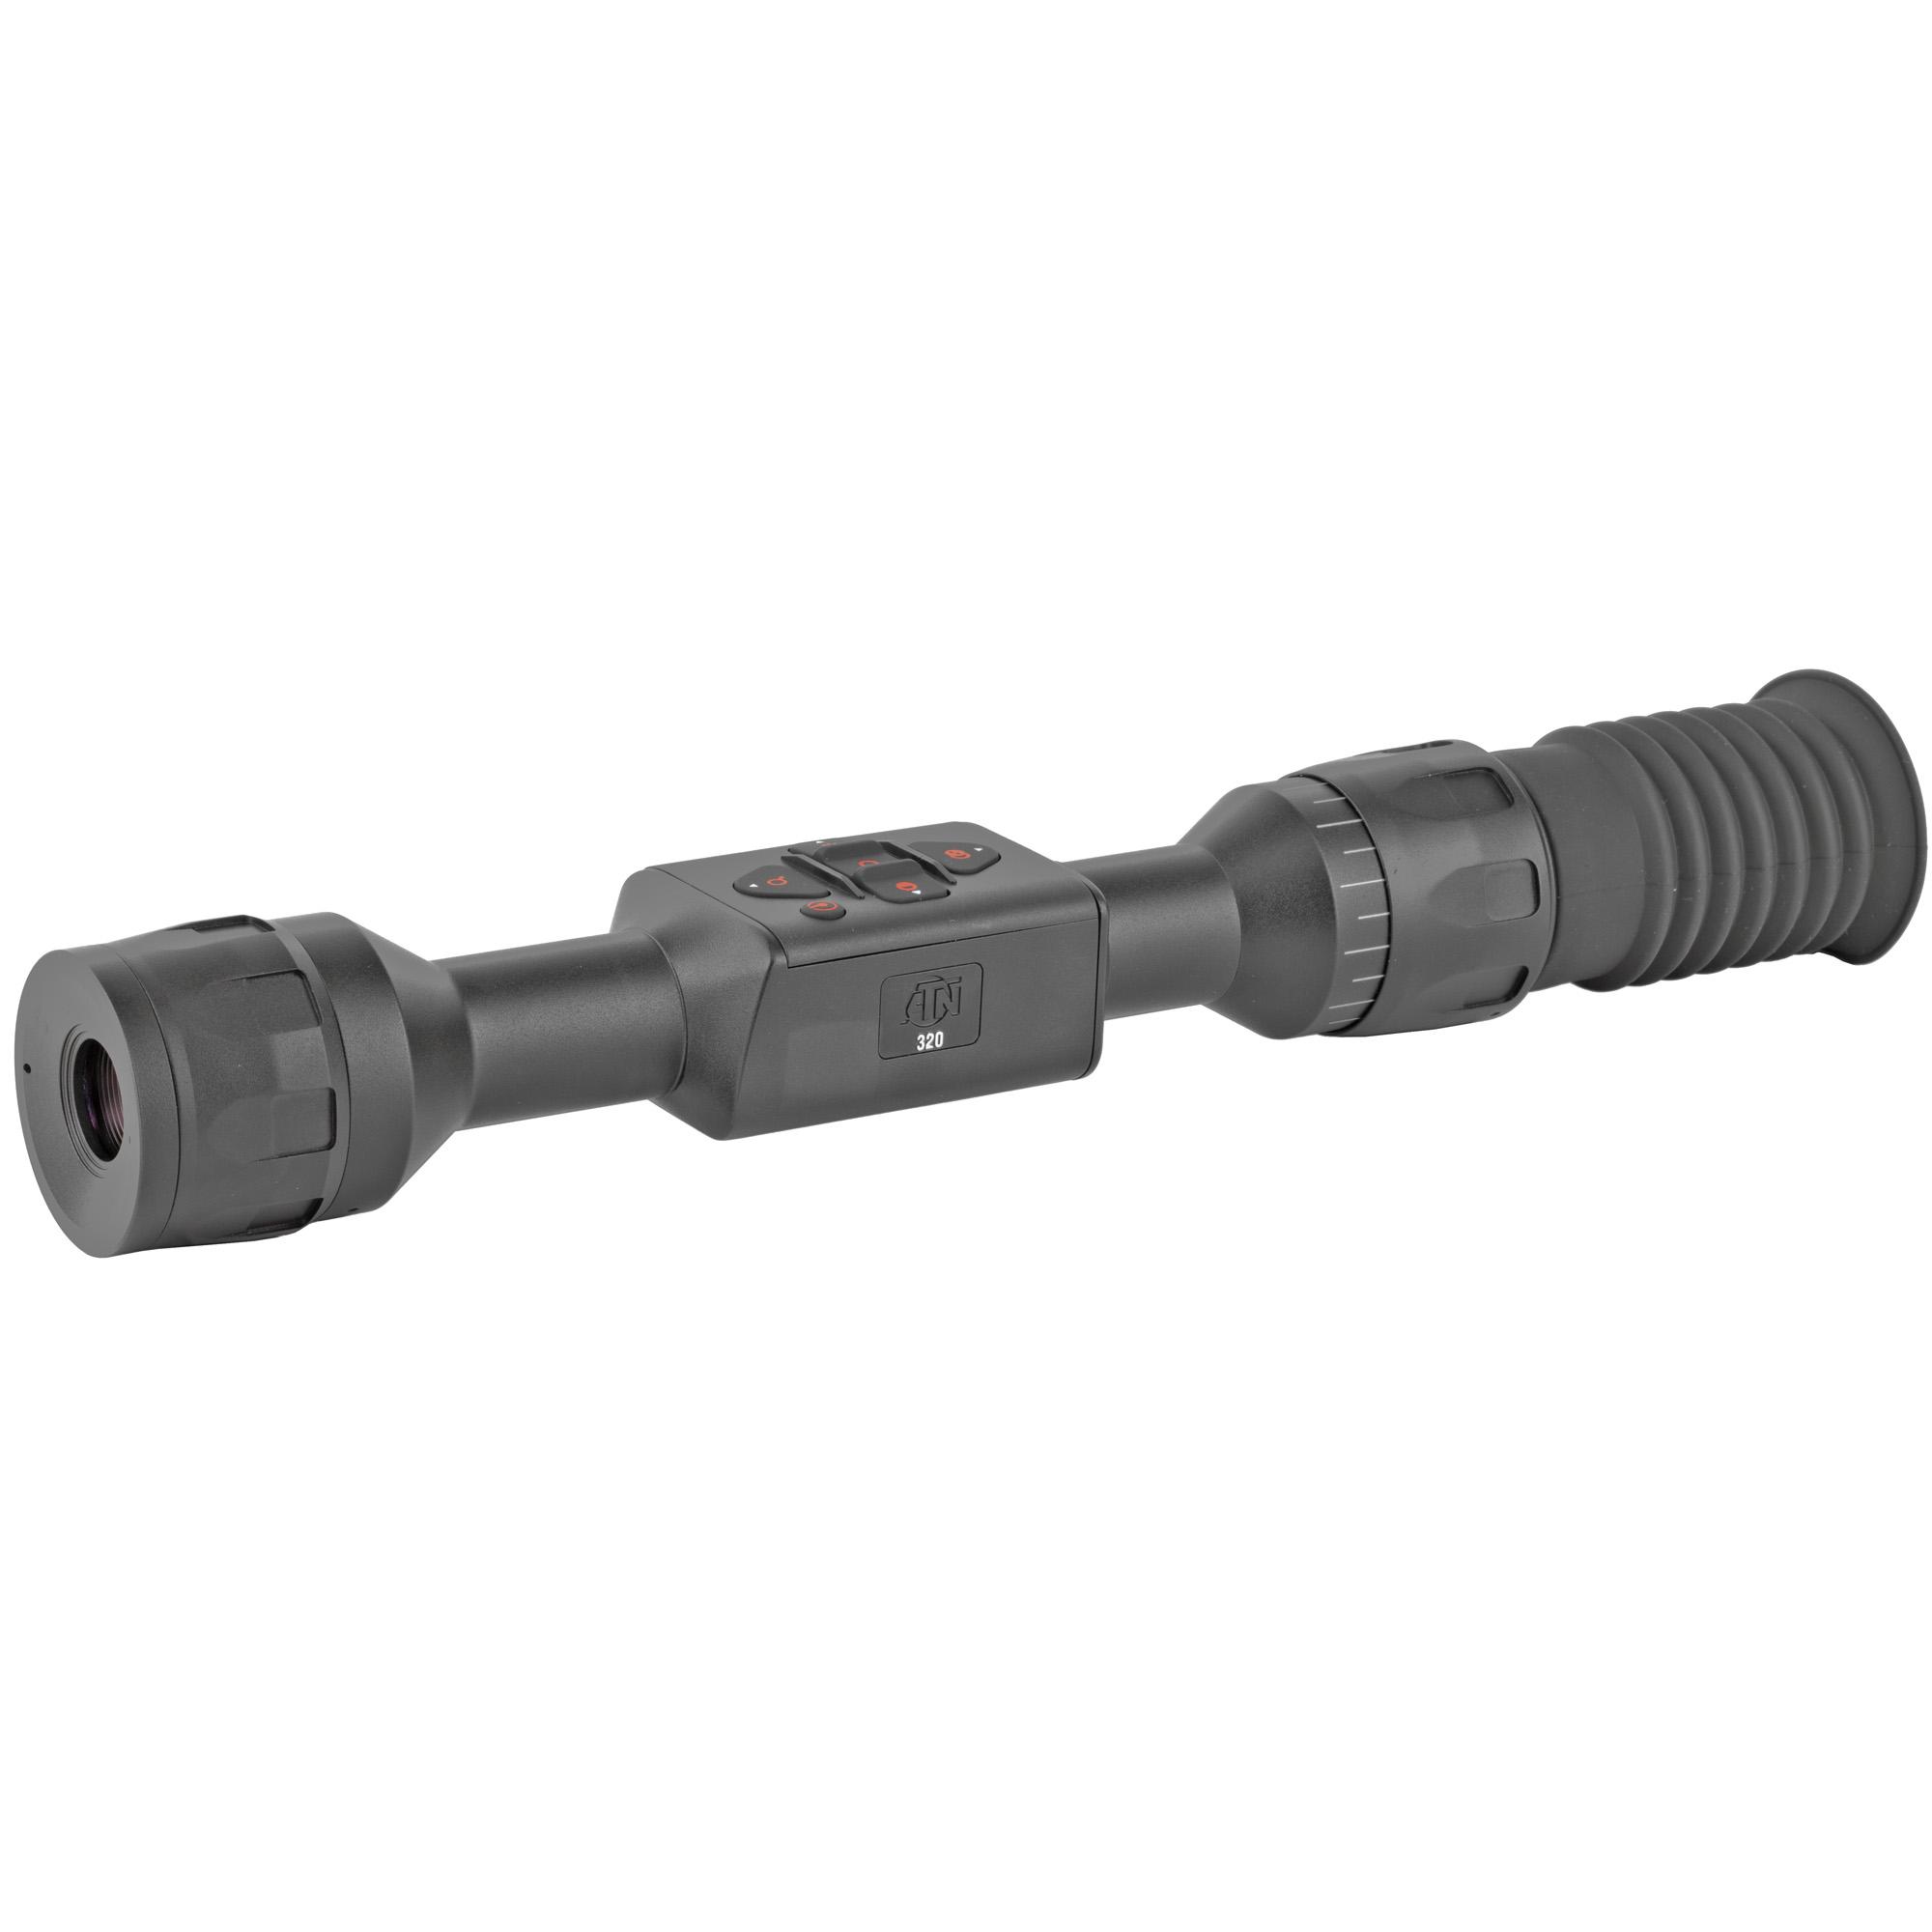 Atn Thor-lt 320 3-6x Thermal Scp